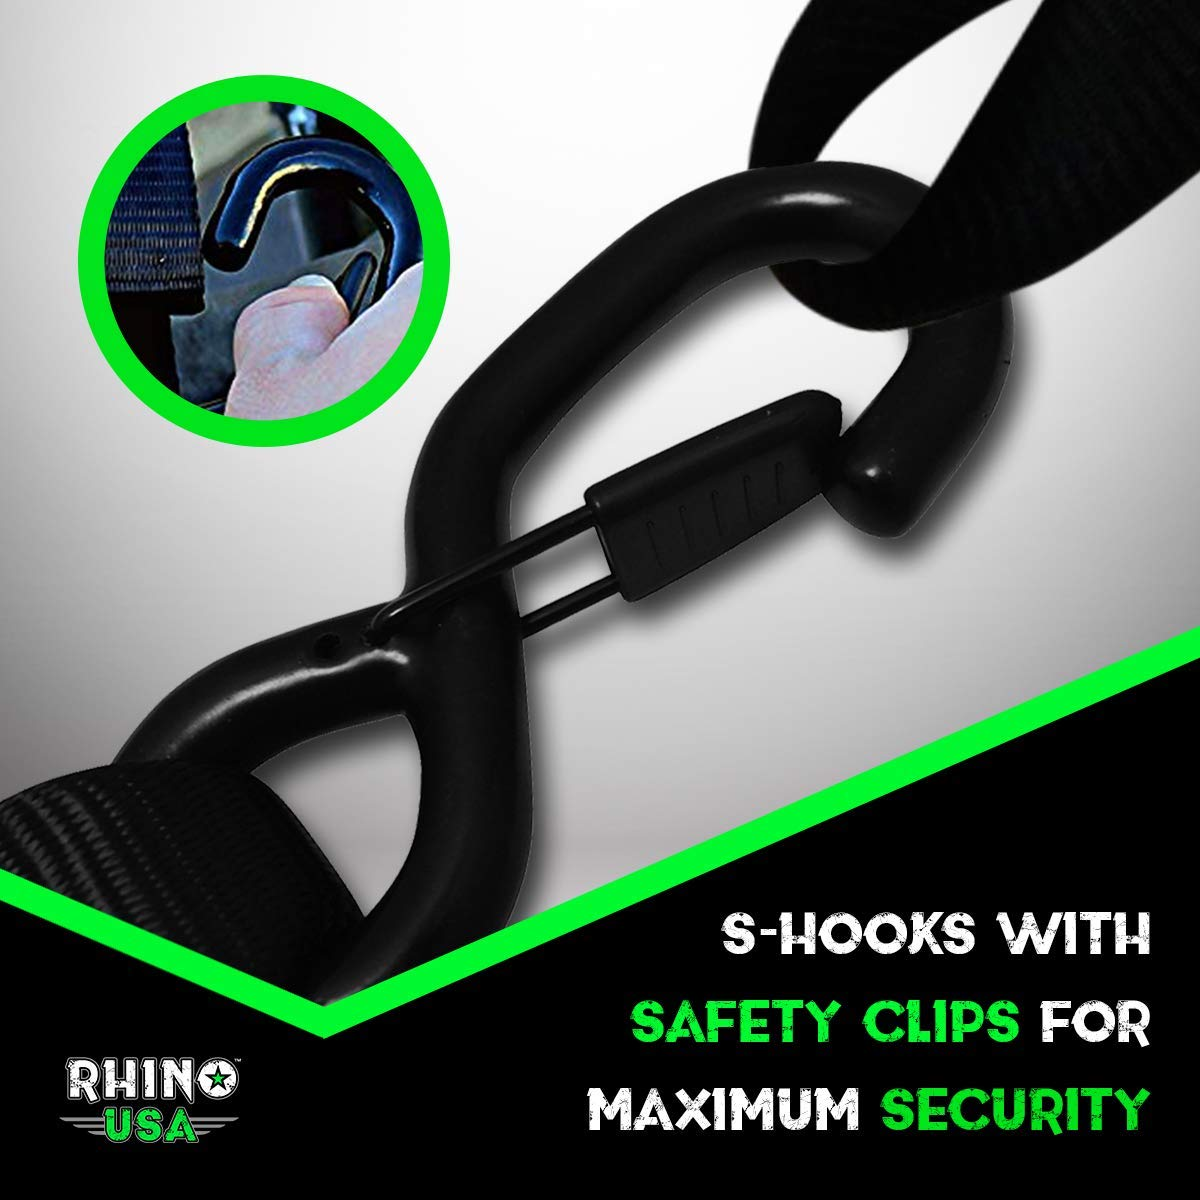 4 5,208 Break Strength - Hea Rhino Usa Ratchet Straps Heavy Duty Tie Down Set